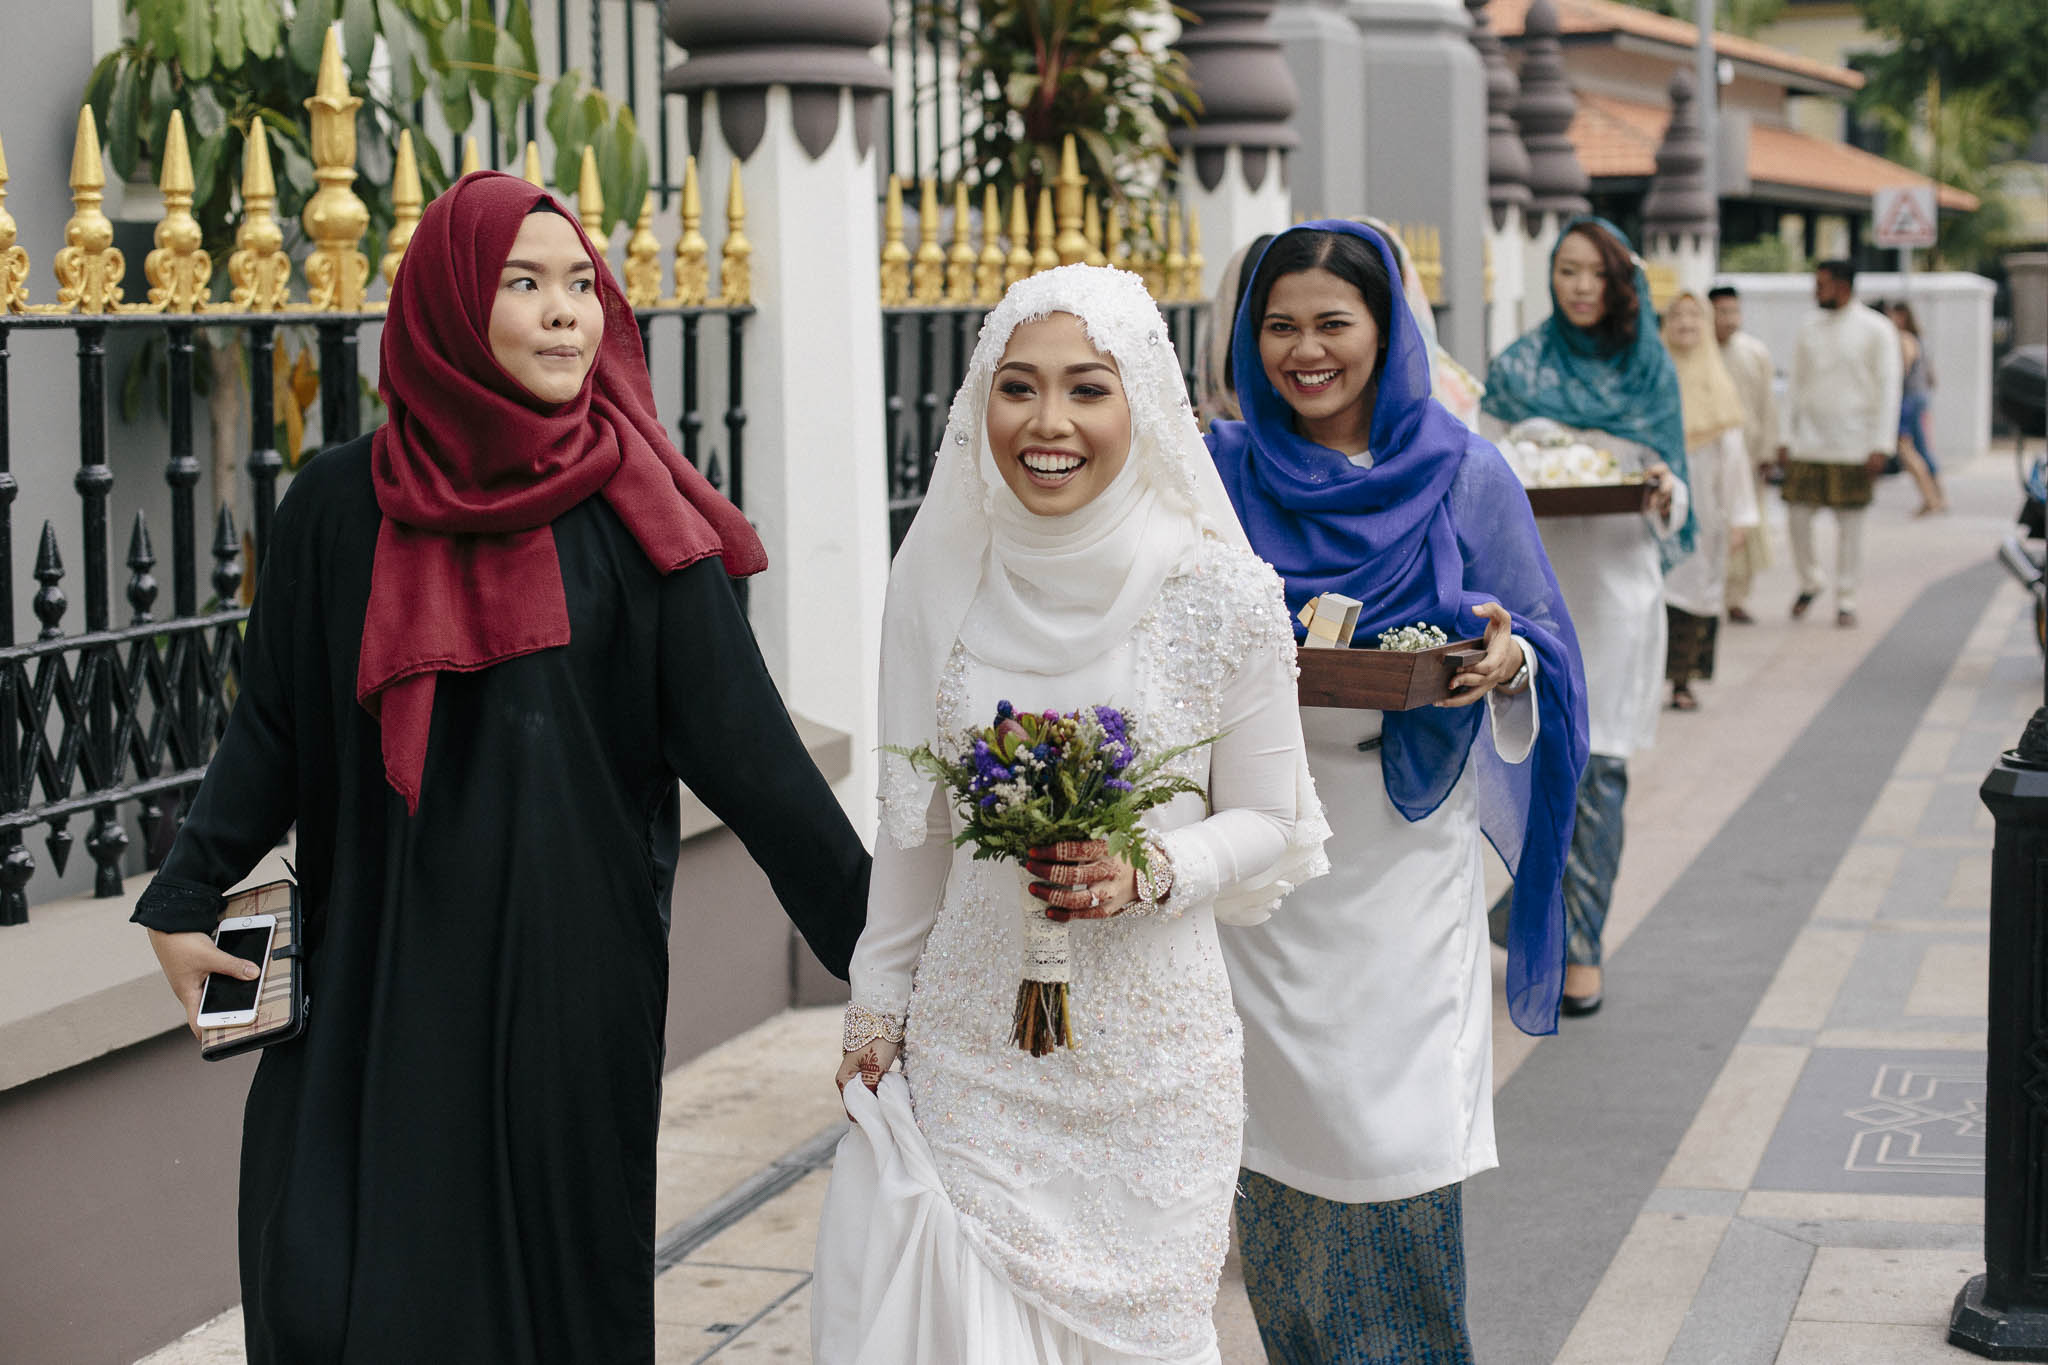 singapore-wedding-photographer-travel-khairul-atikah-09.jpg